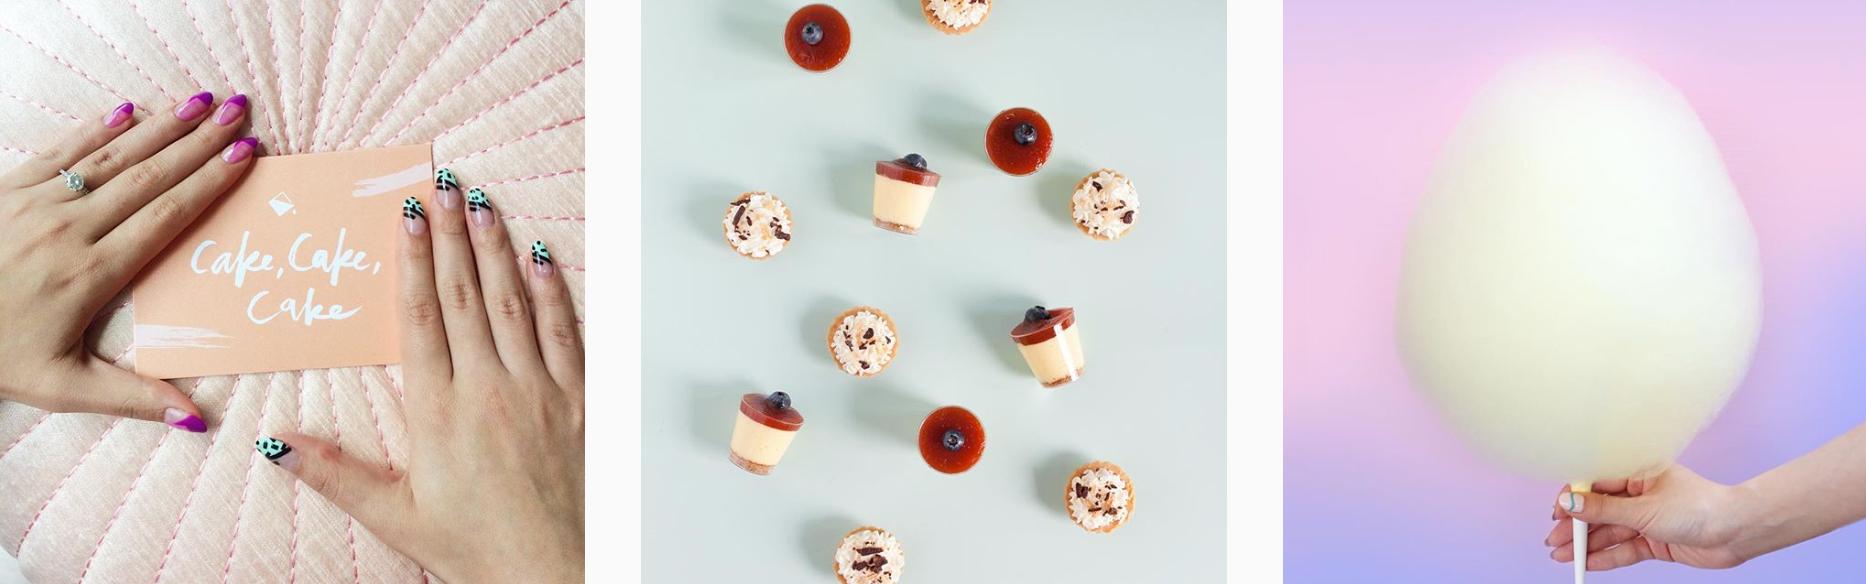 Meet the Creators: Dessert Goals - PLANOLY Blog 6